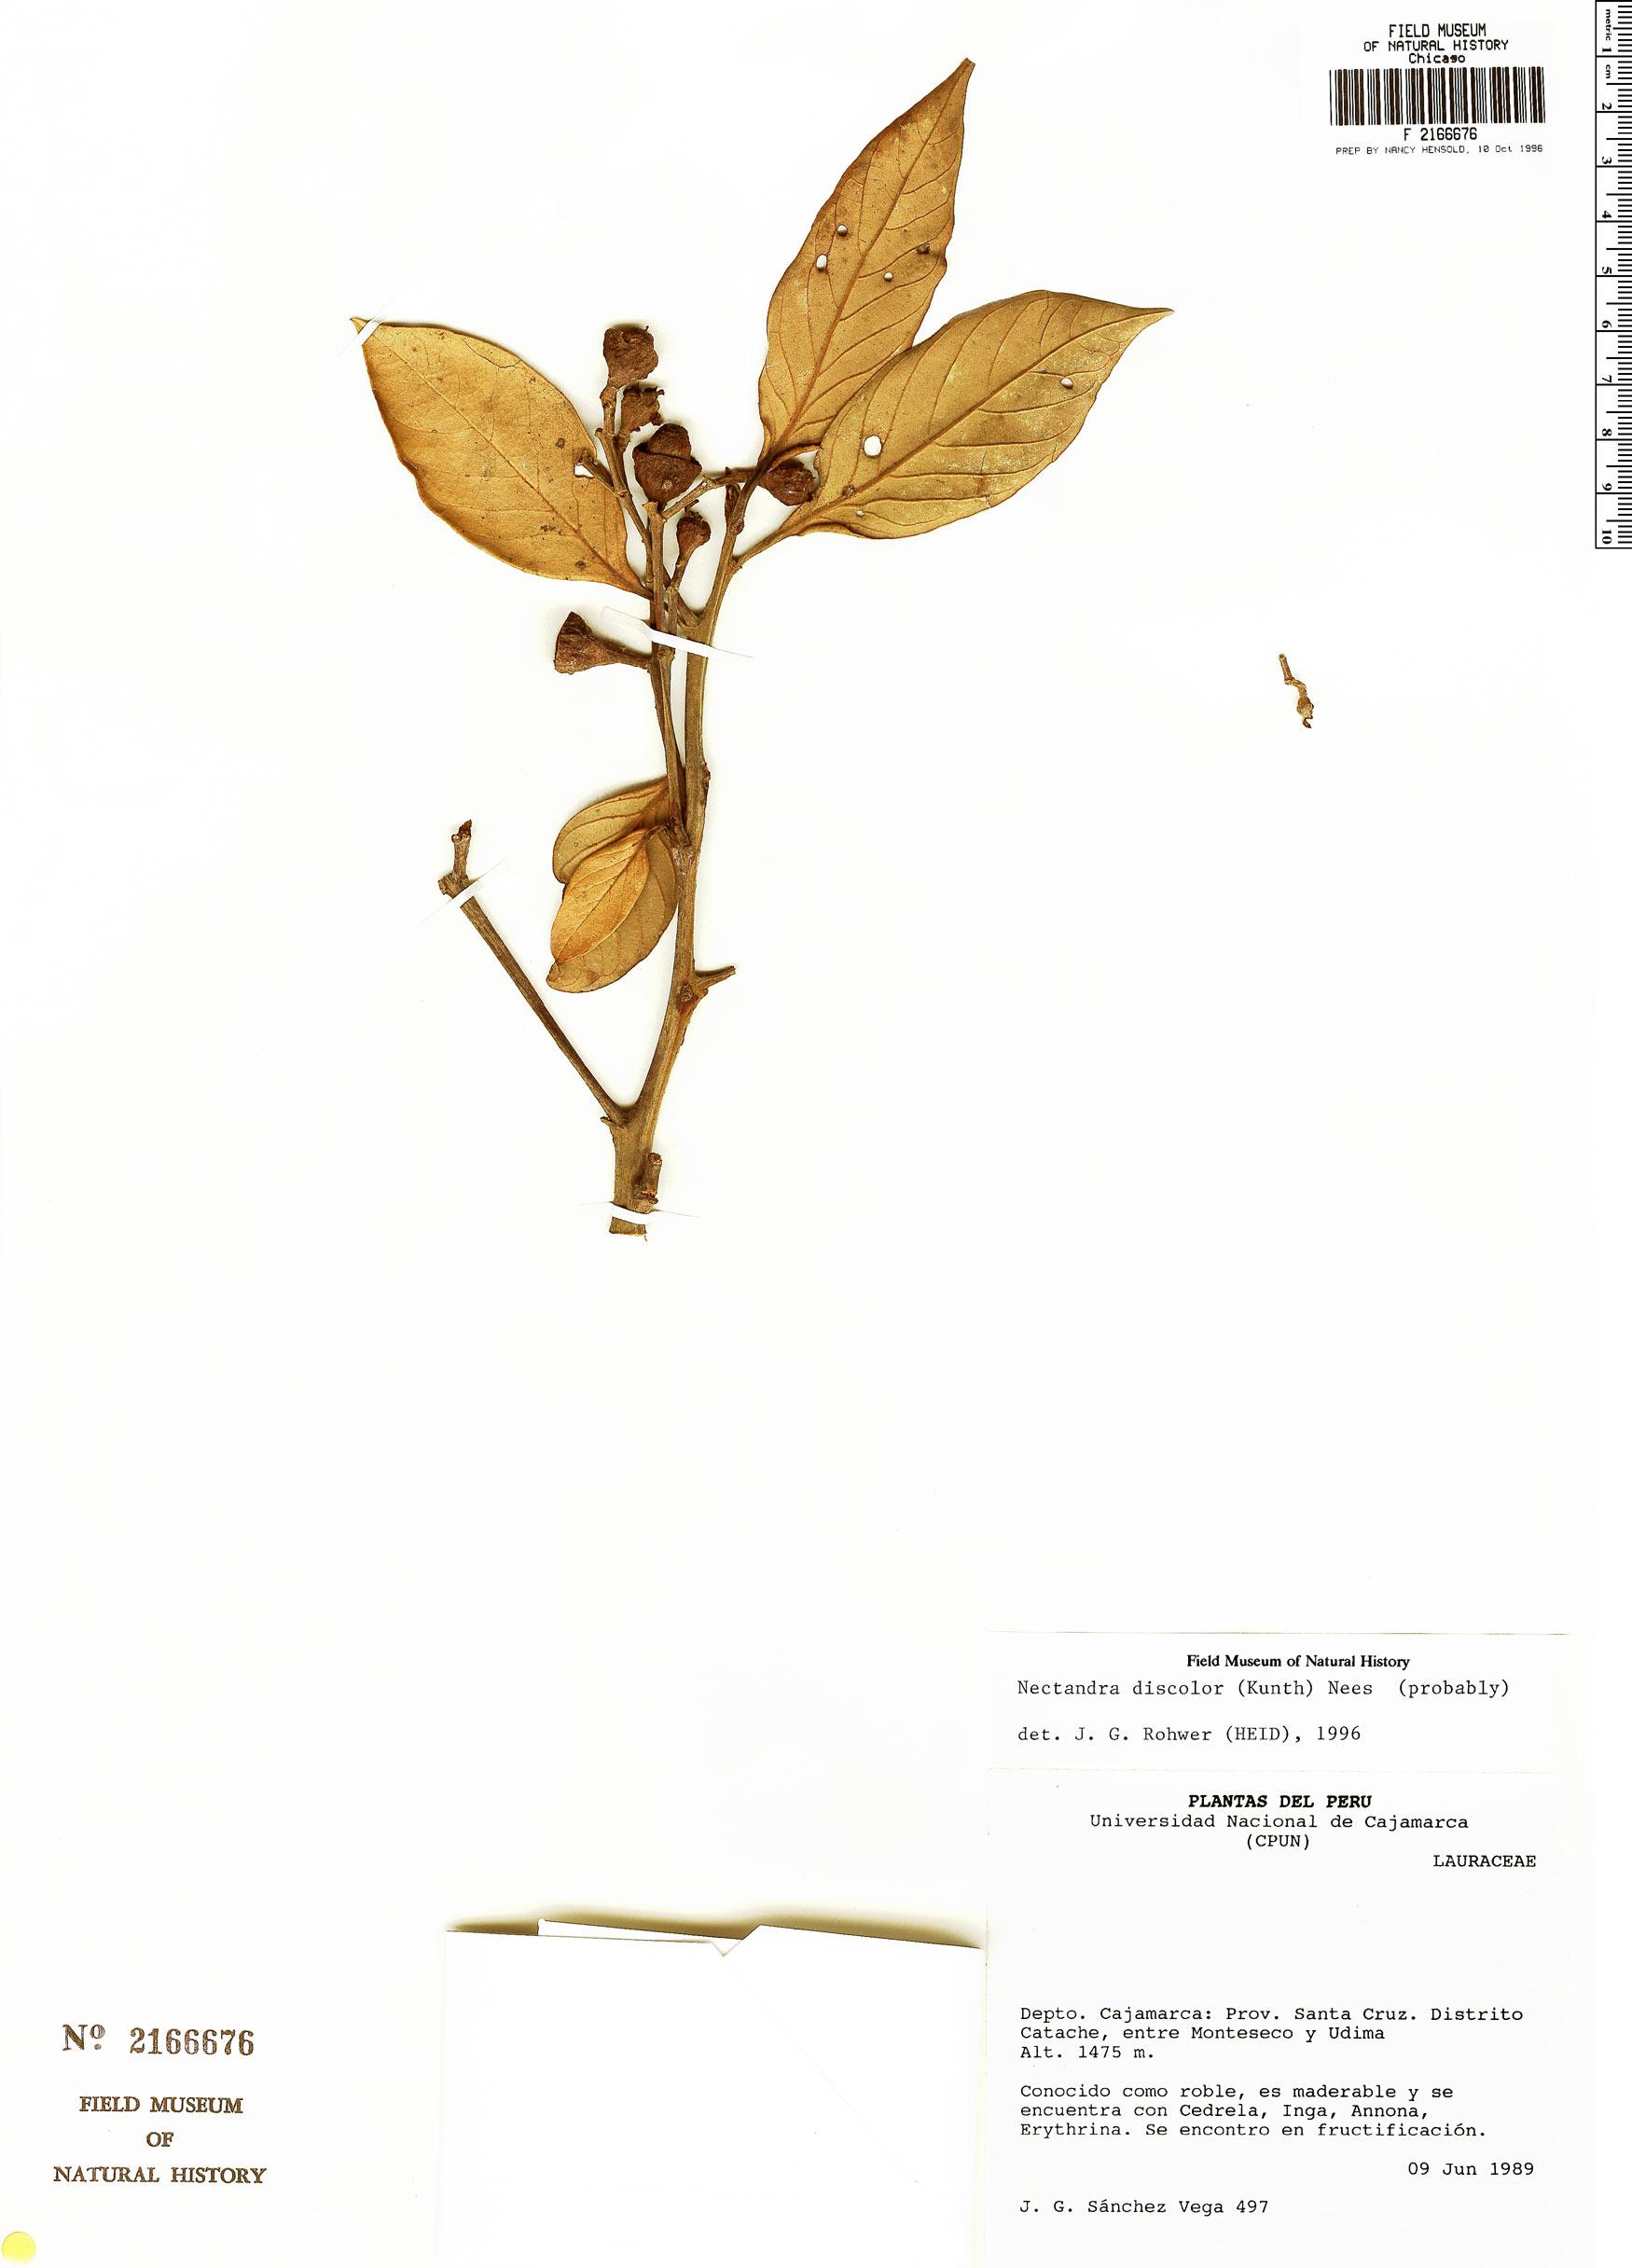 Espécimen: Nectandra discolor